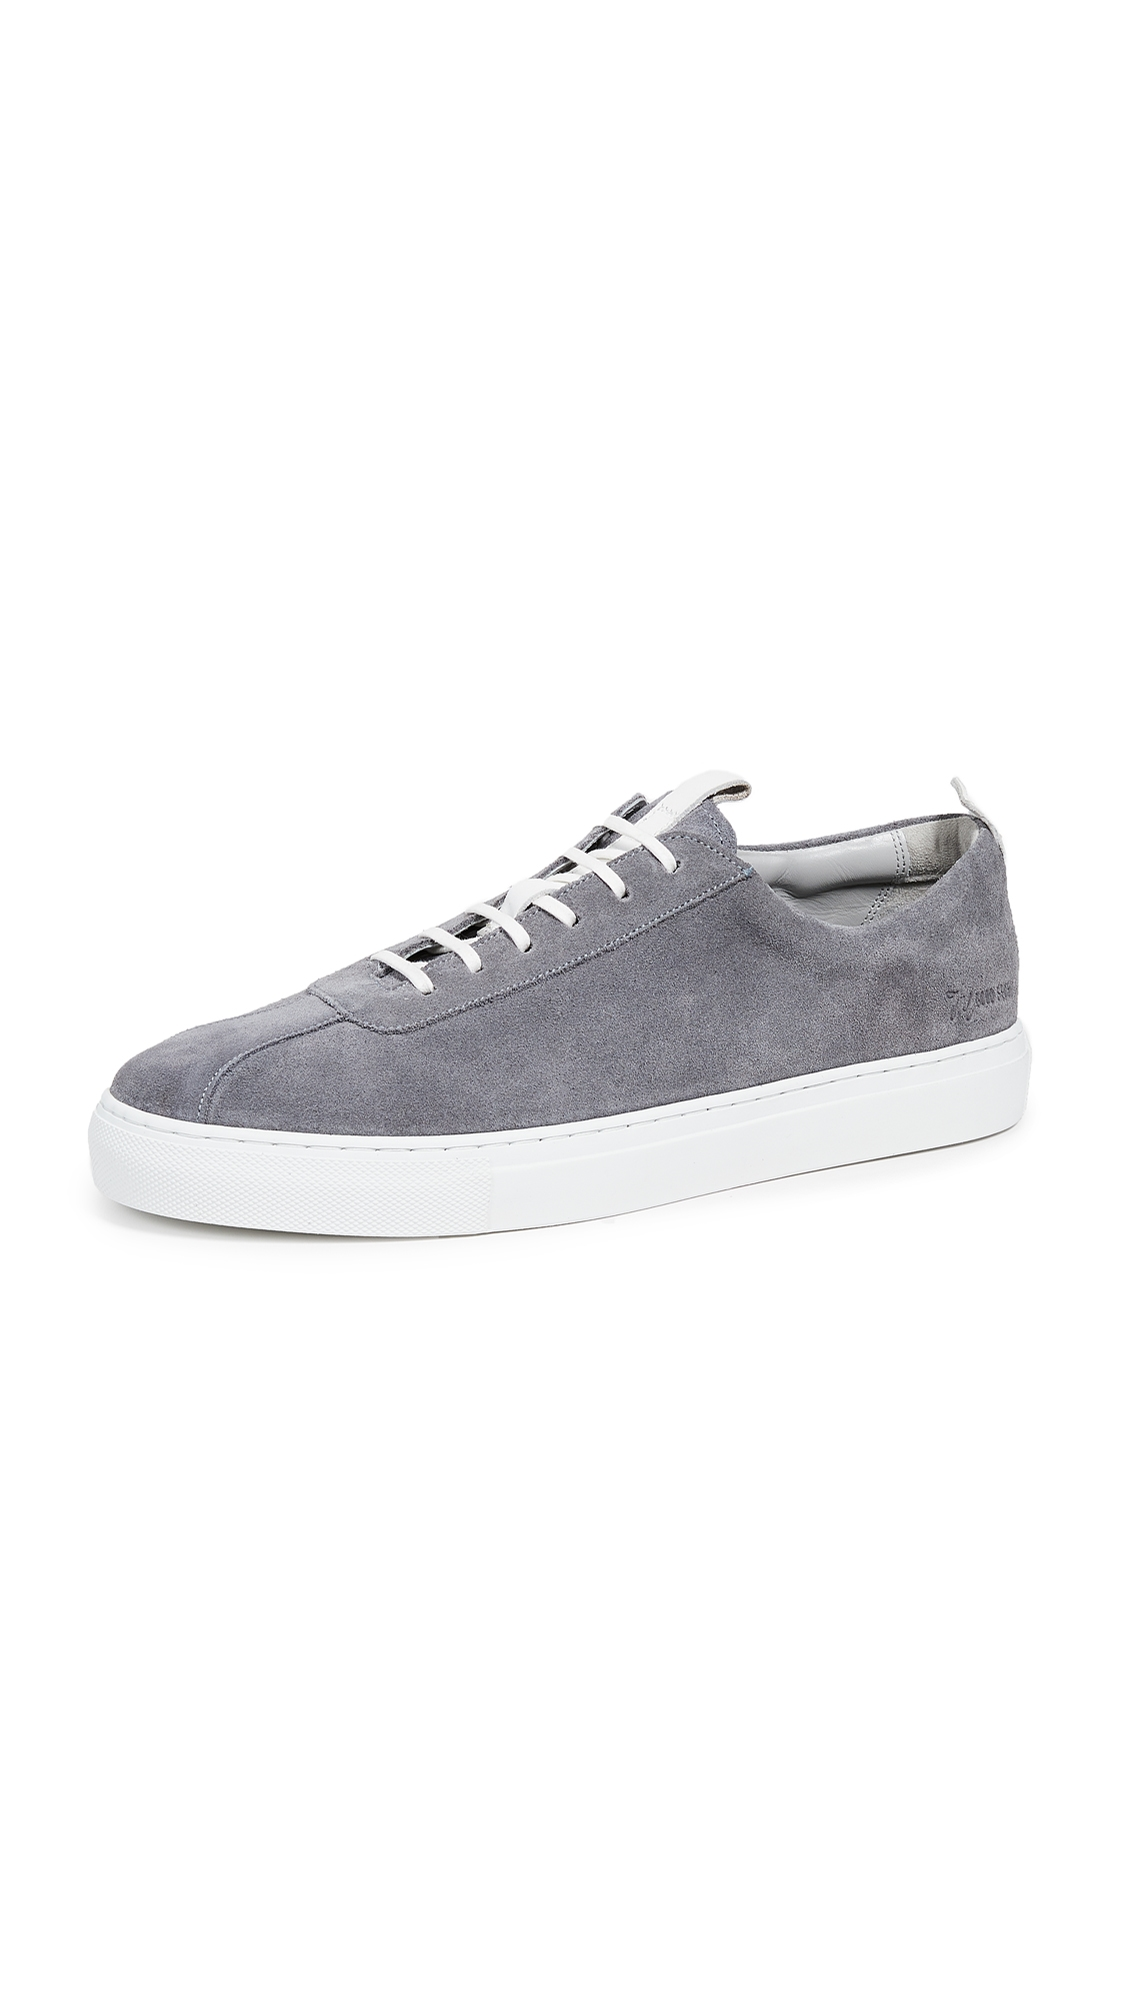 GRENSON Sneaker 1 Grey Suede Trainers in Ash Grey